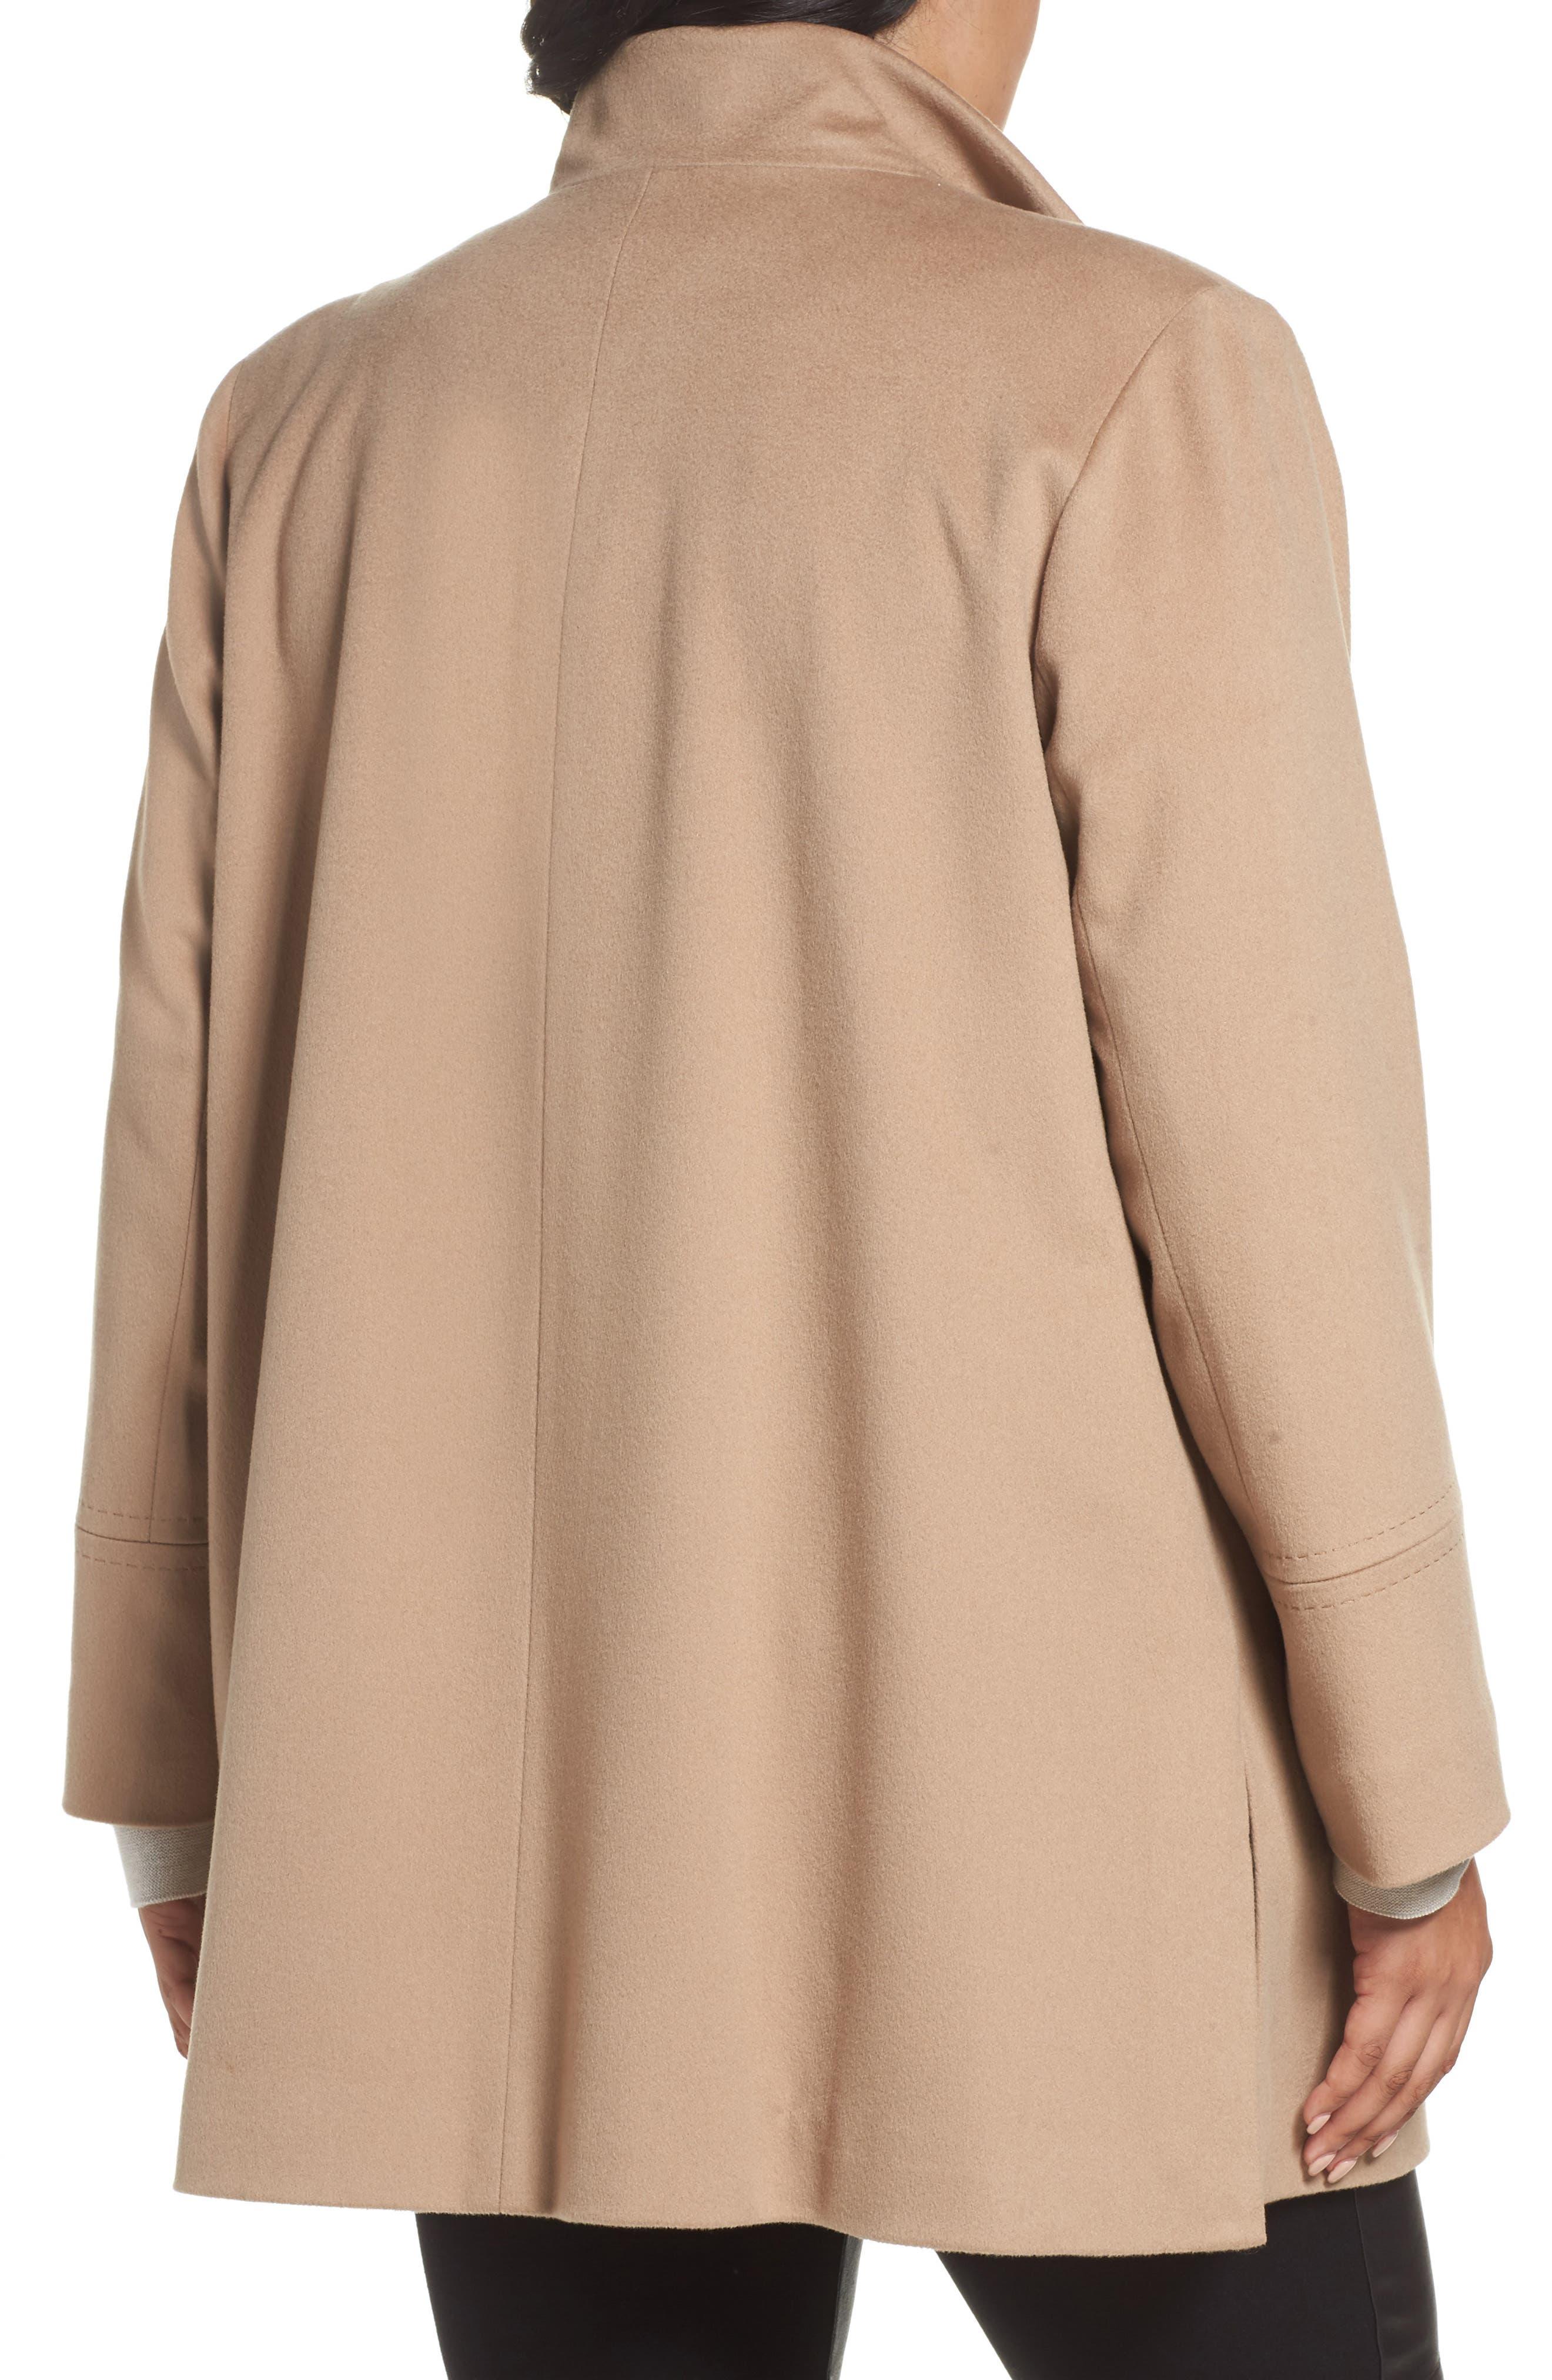 Alternate Image 2  - Fleurette Wool Car Coat (Plus Size) (Nordstrom Exclusive)